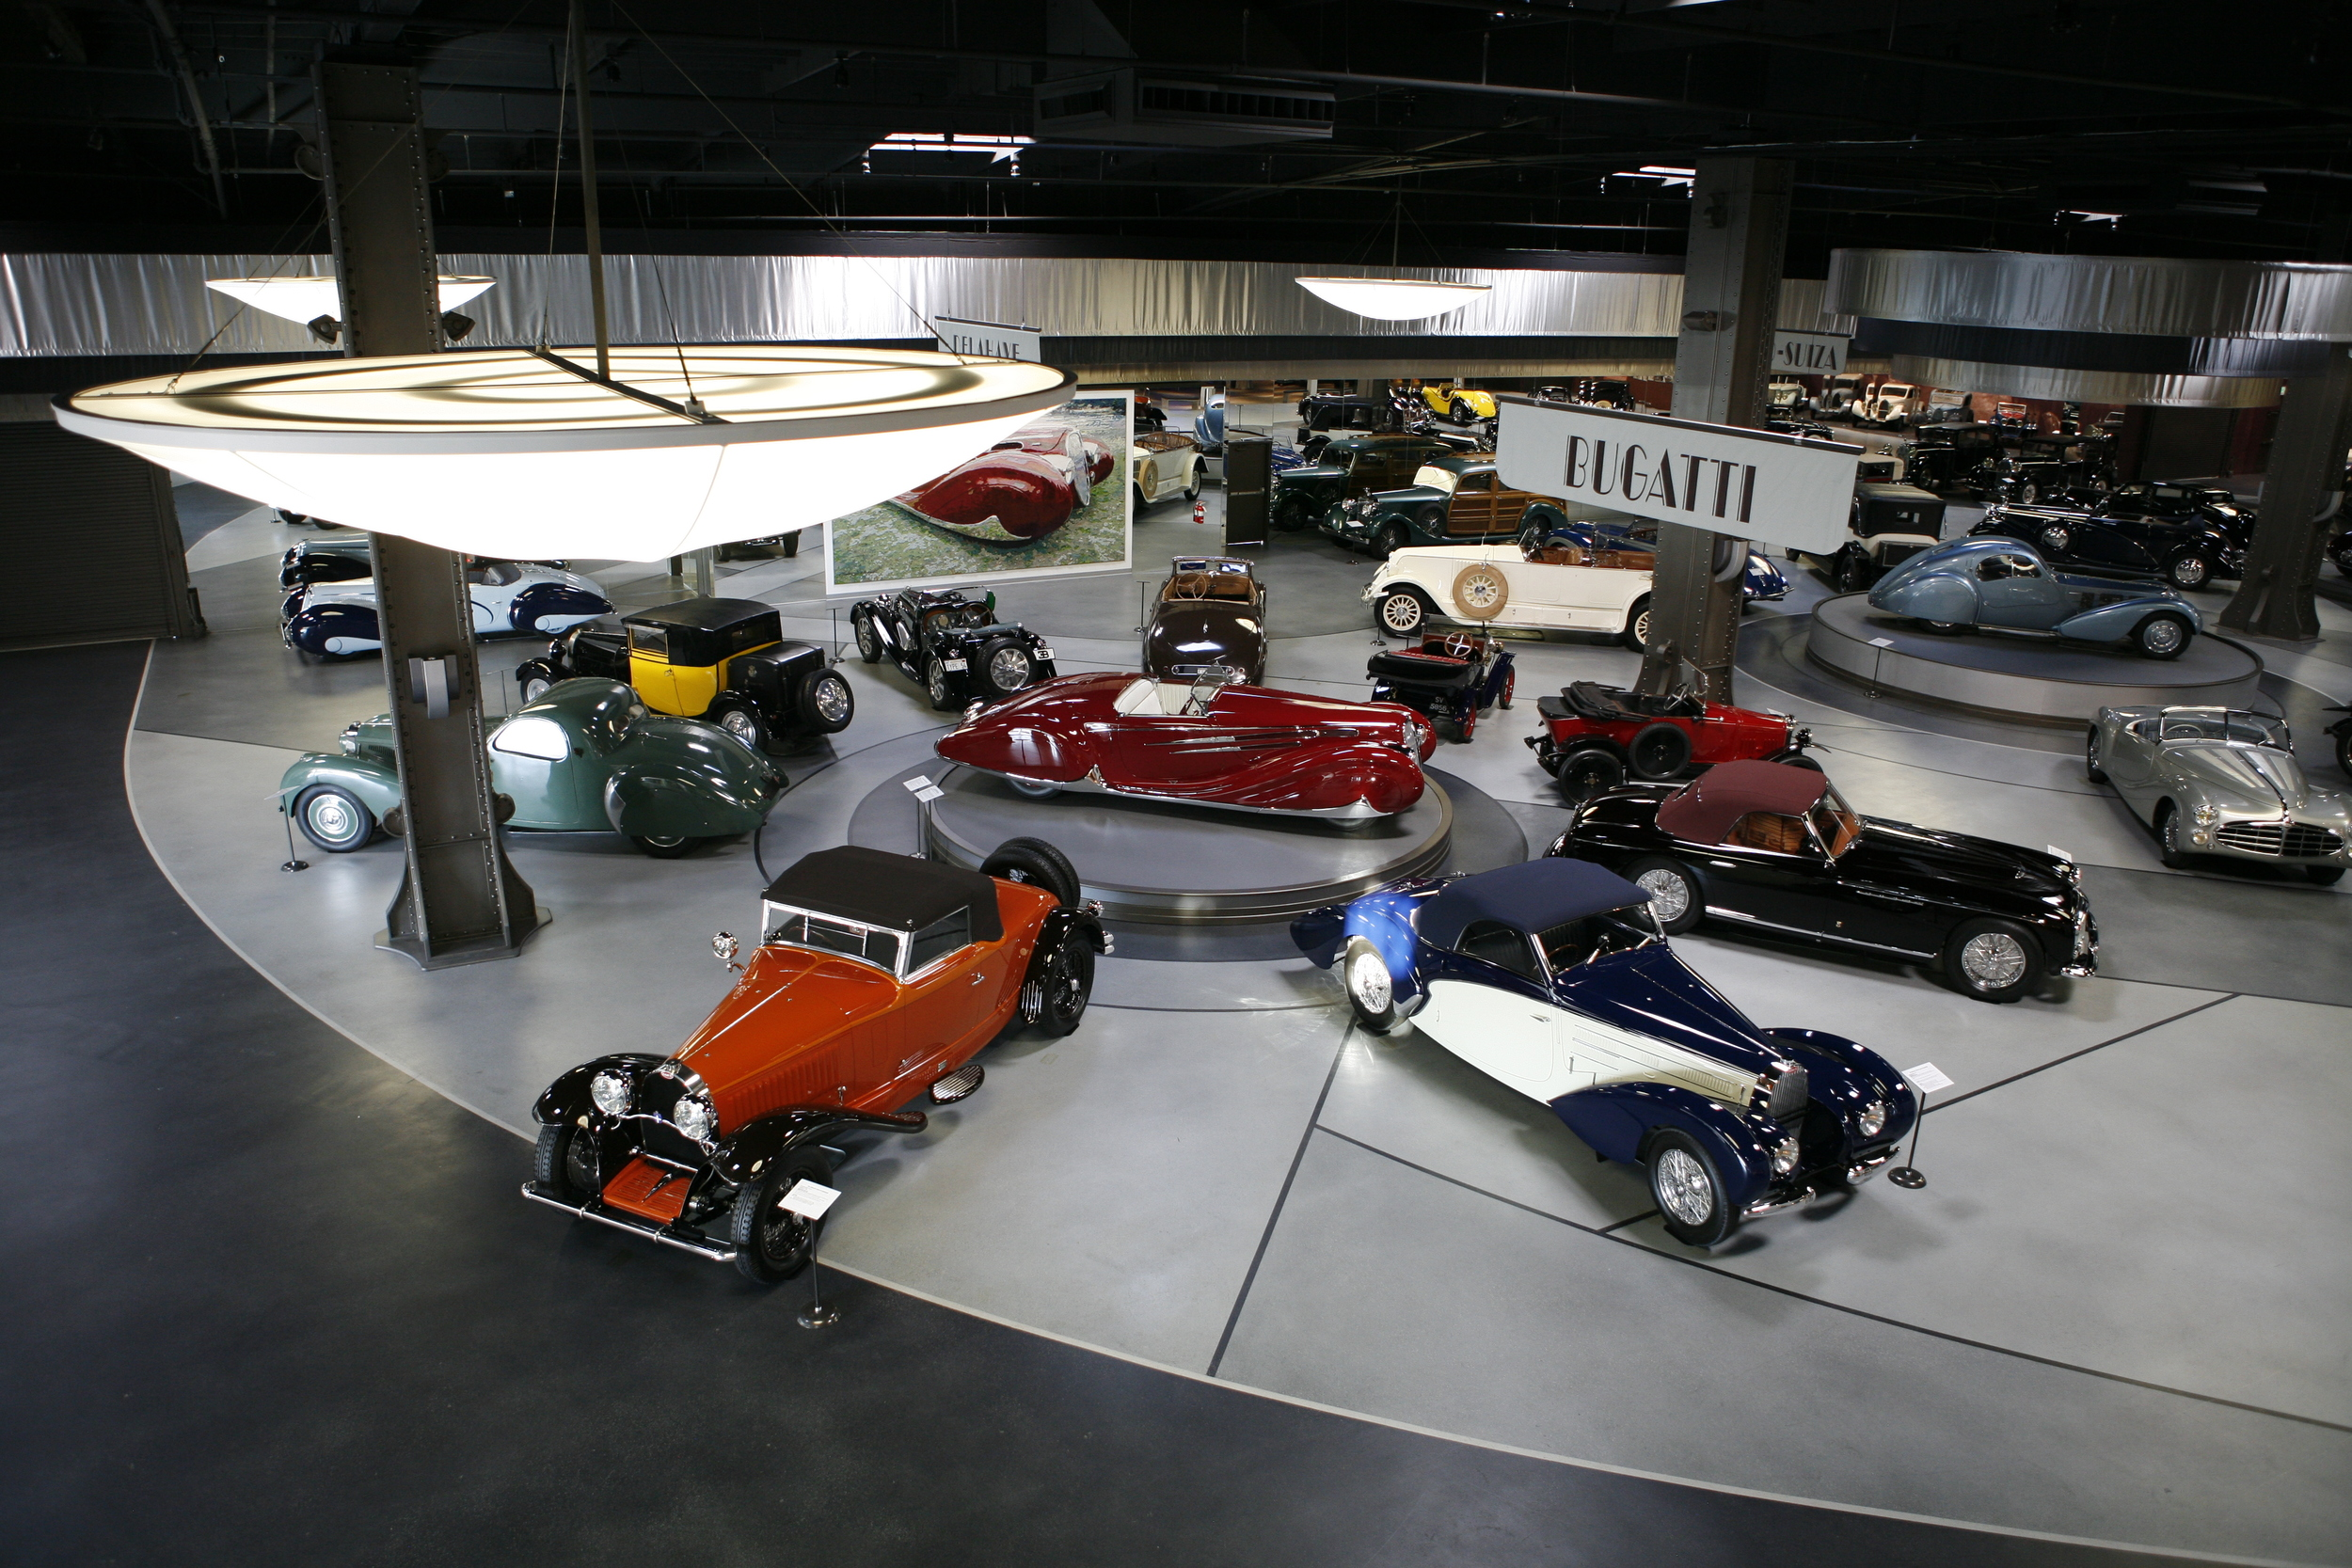 Petersen Automotive Museum >> The 10 Best Car Museums in the U.S. - Galerie